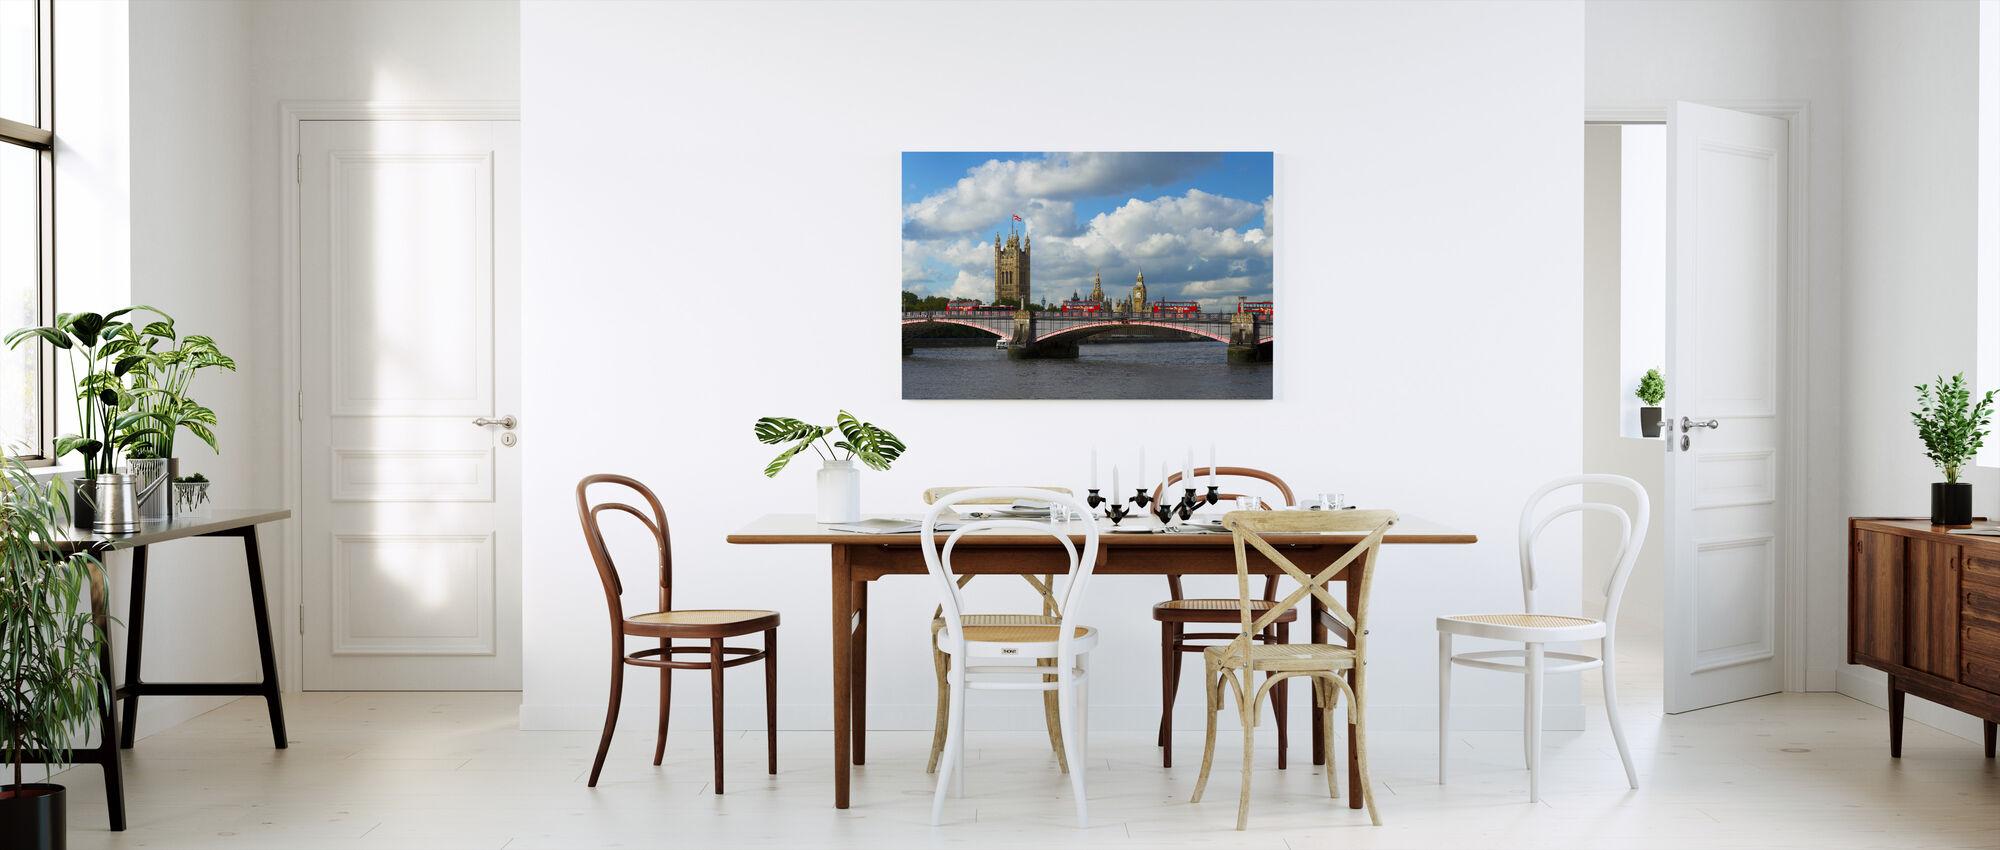 Autobusy na Lambeth Bridge - Obraz na płótnie - Kuchnia